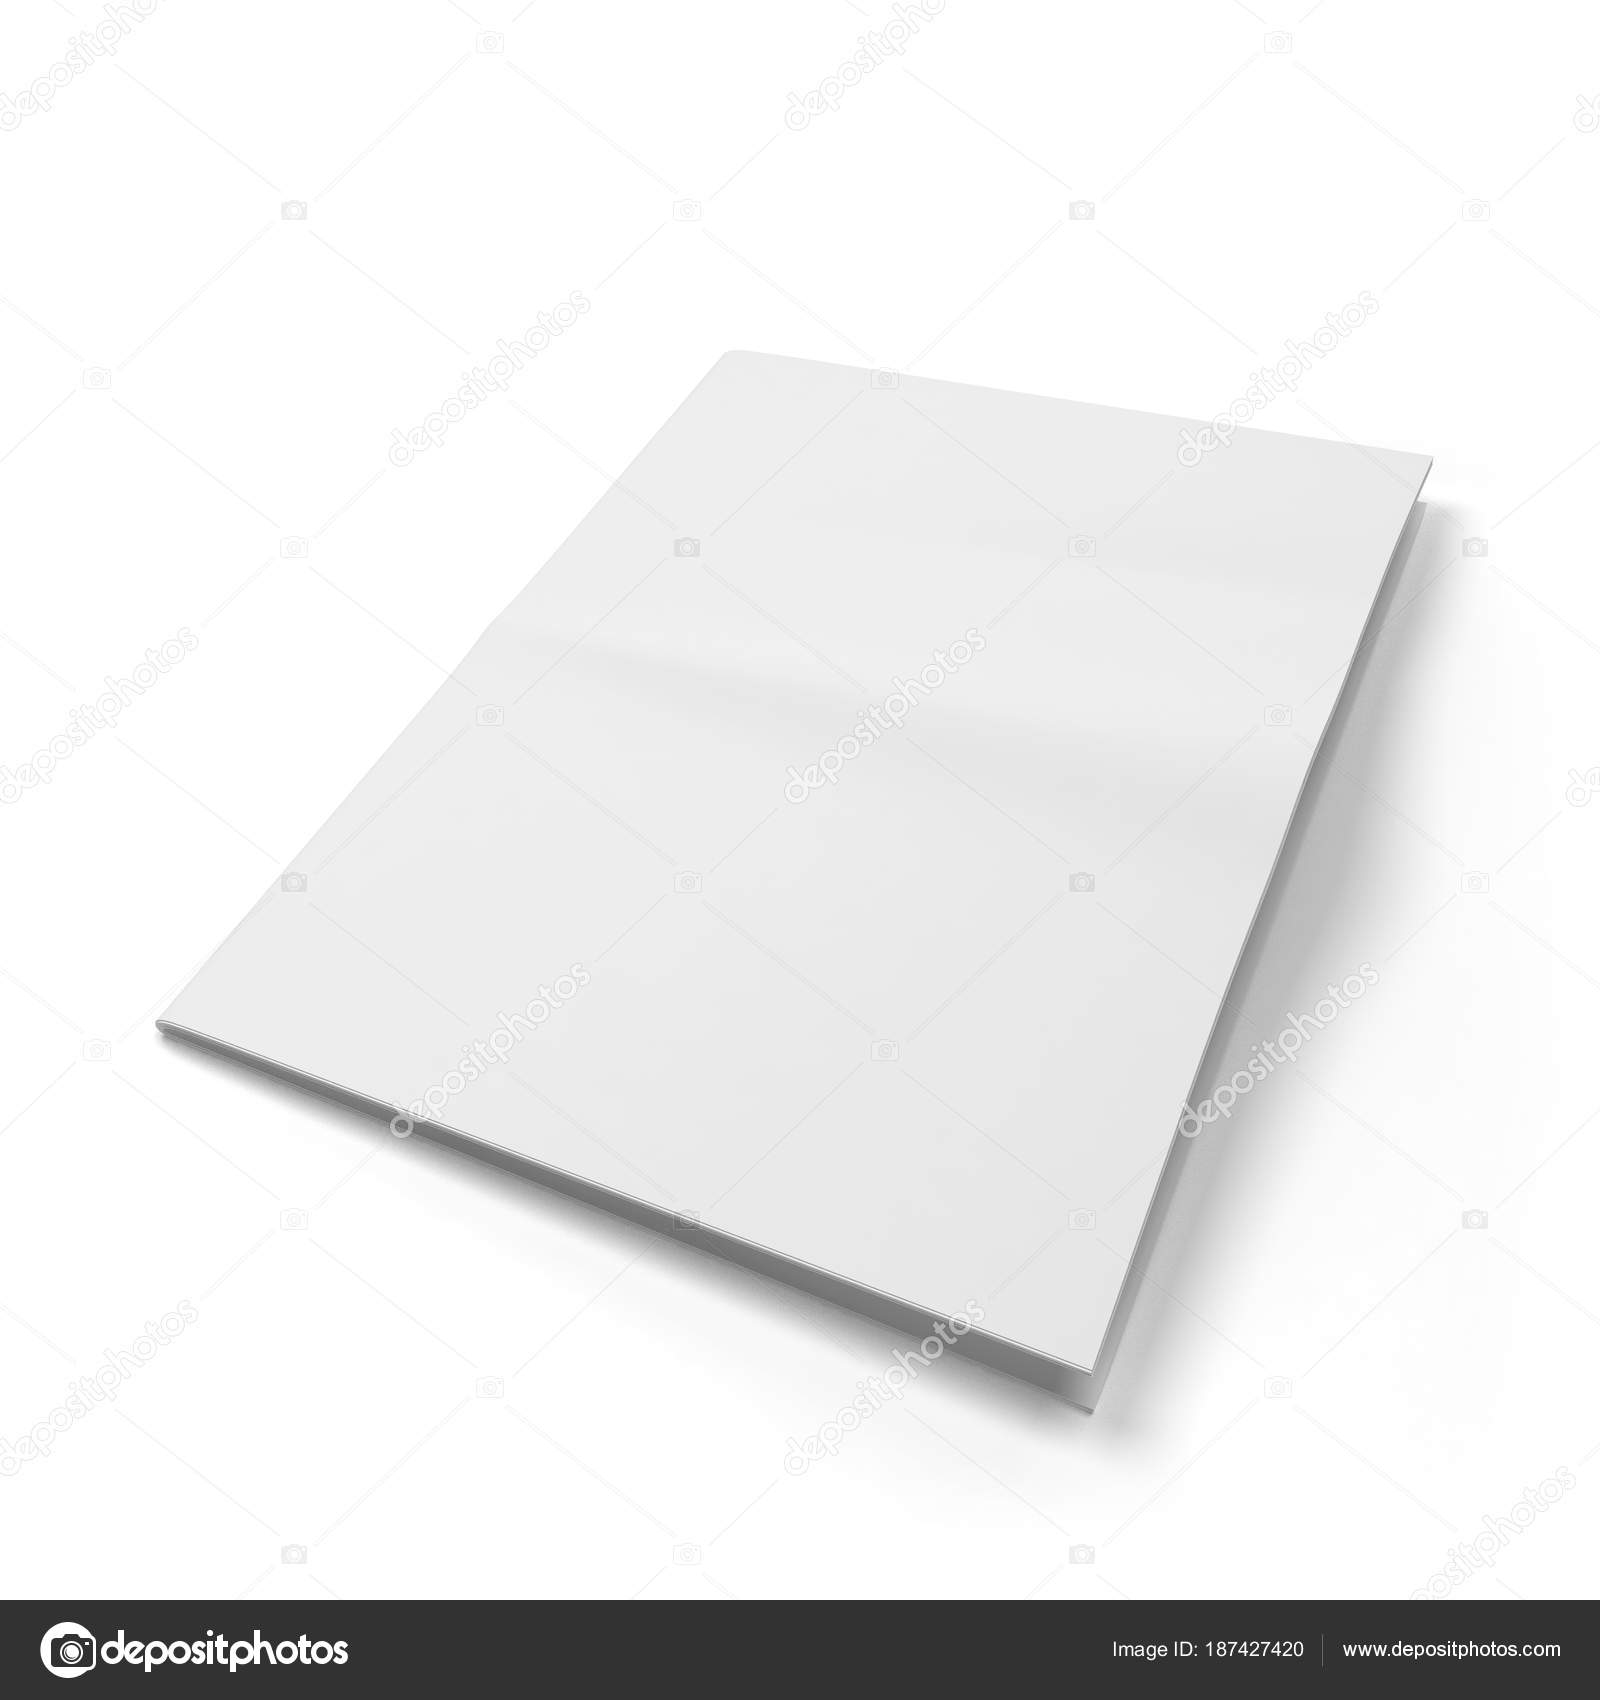 Blank Newspaper Template Stock Photo